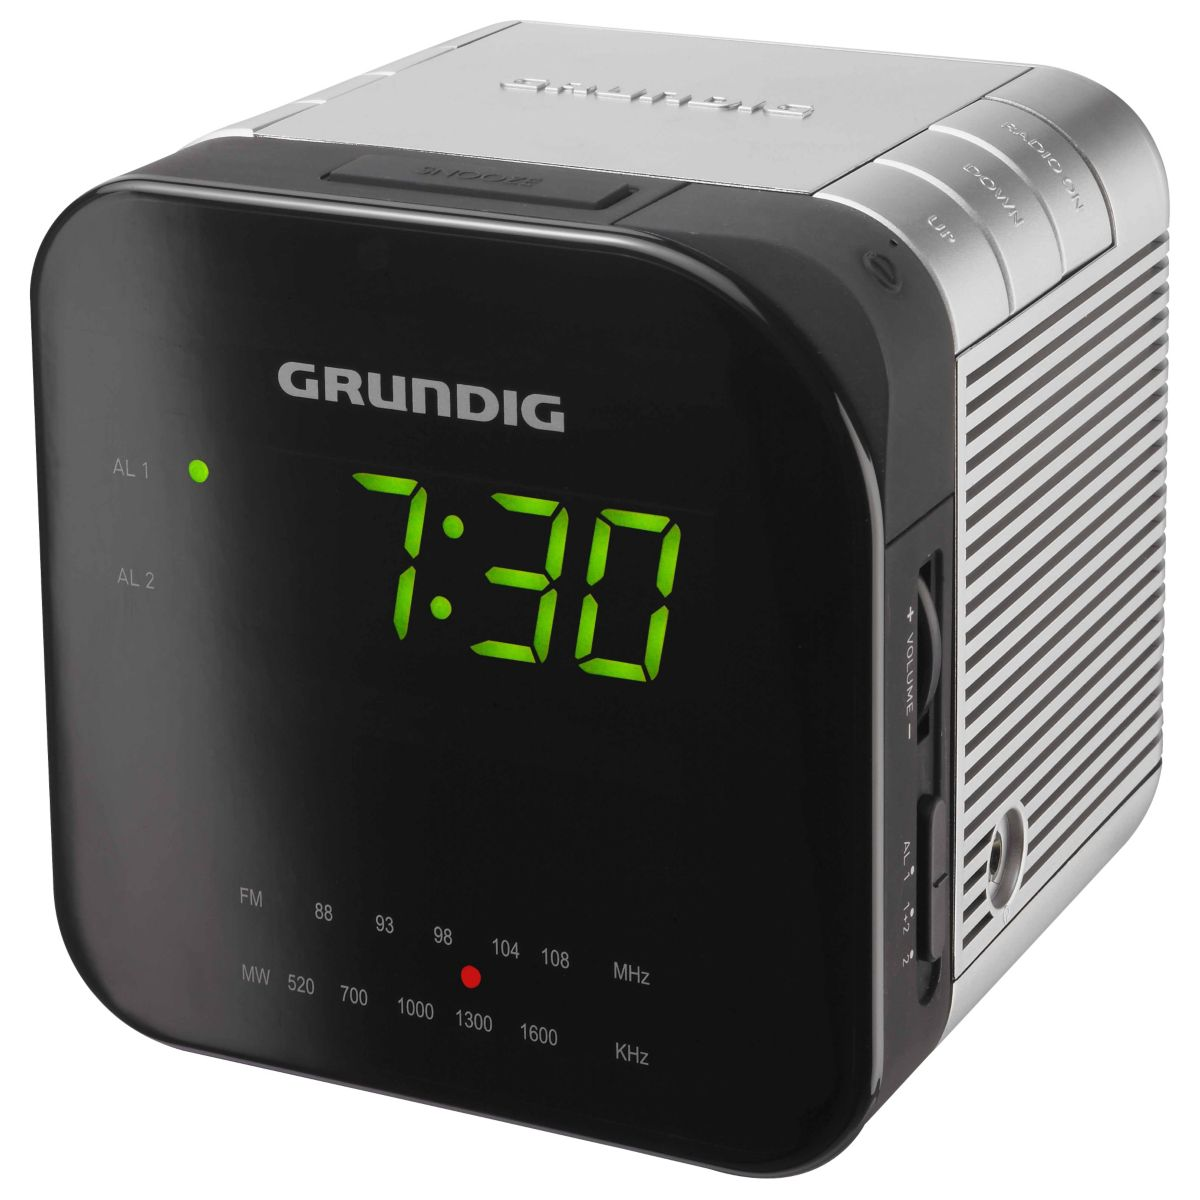 Radio-réveil GRUNDIG SC 590 (photo)